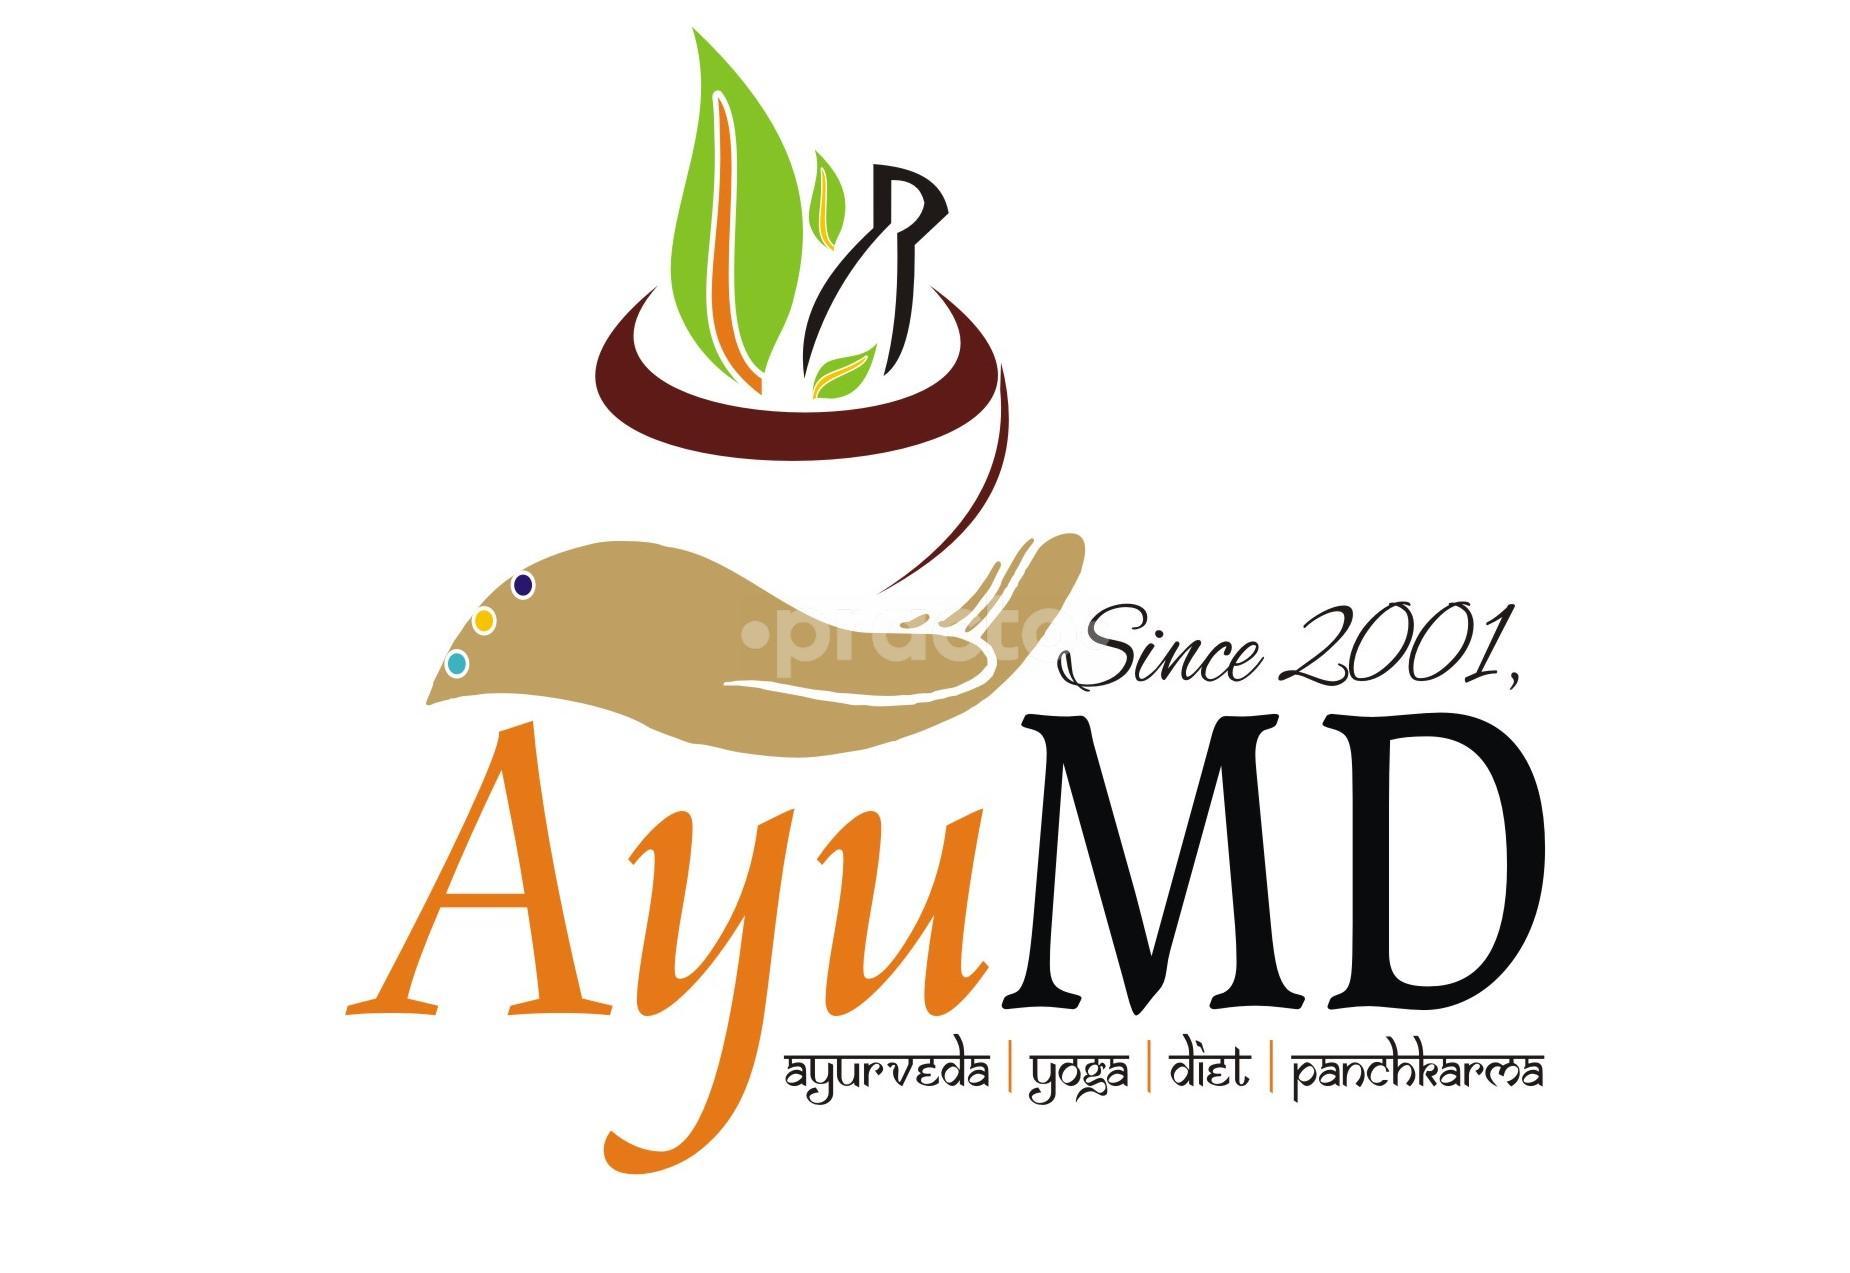 AyuMD Super Speciality Ayurveda for Psoriasis & Vitiligo